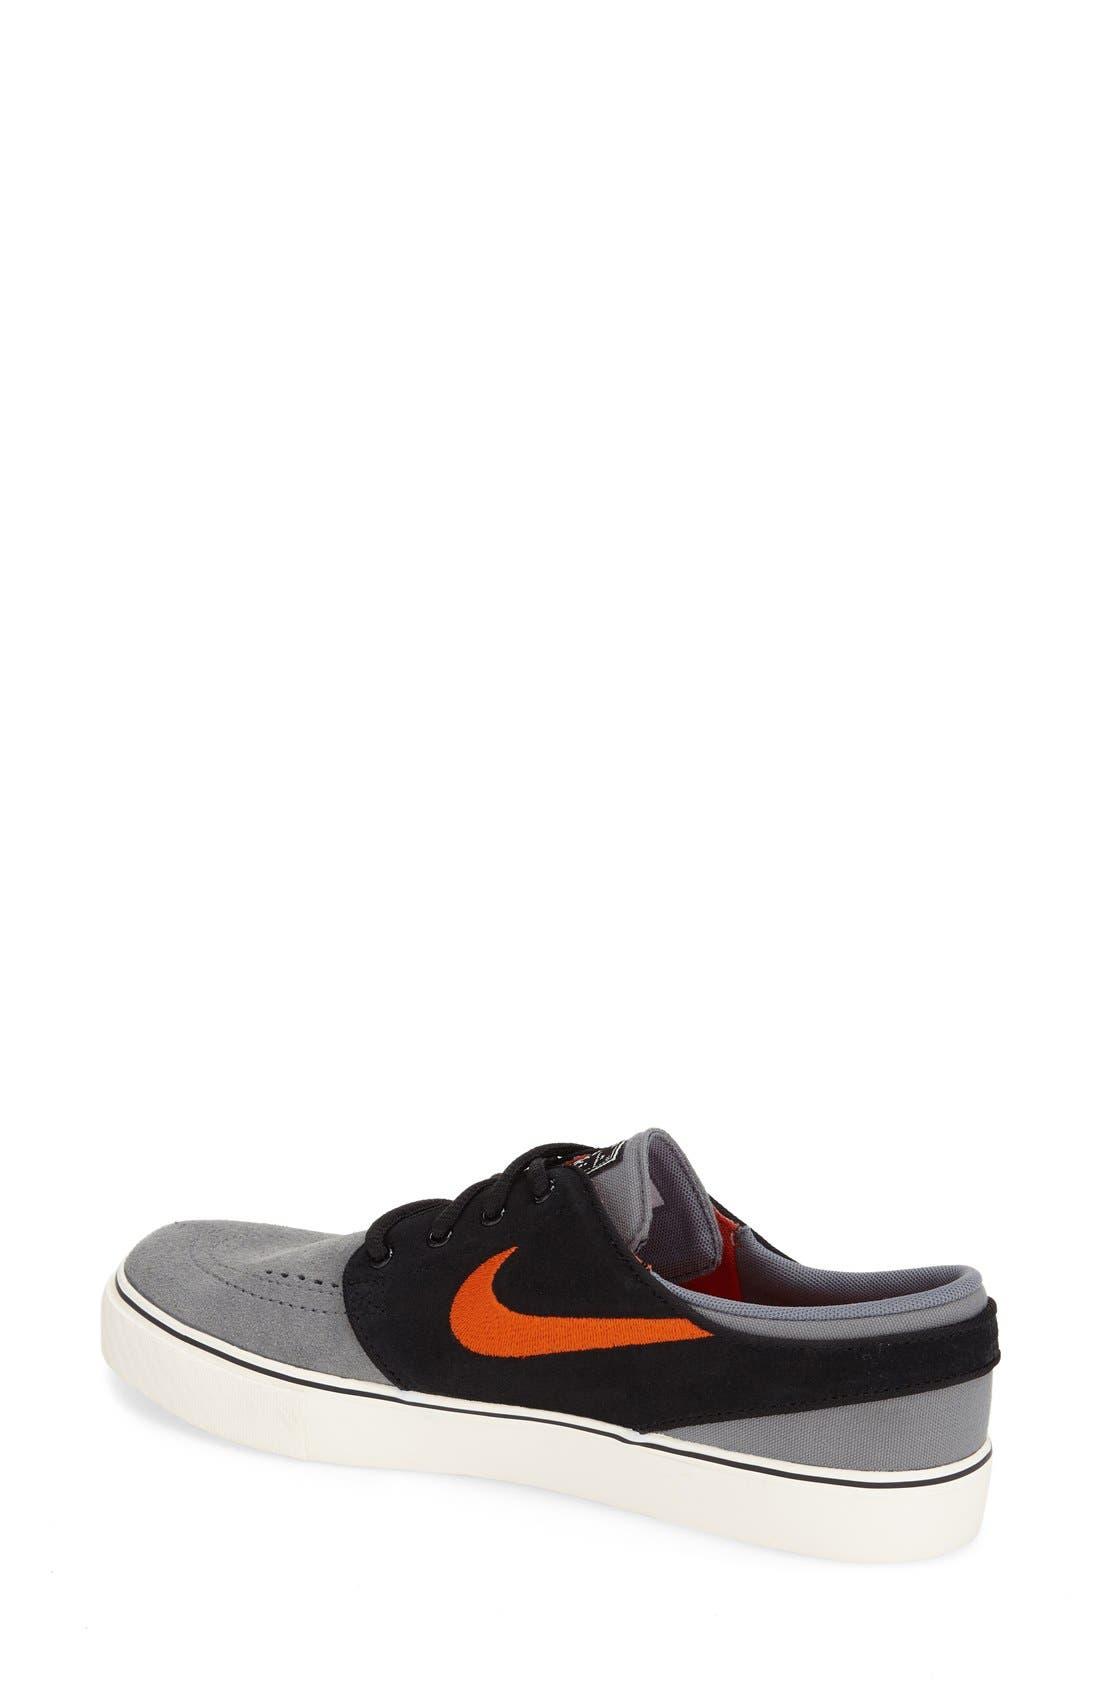 'Stefan Janoski' Sneaker,                             Alternate thumbnail 39, color,